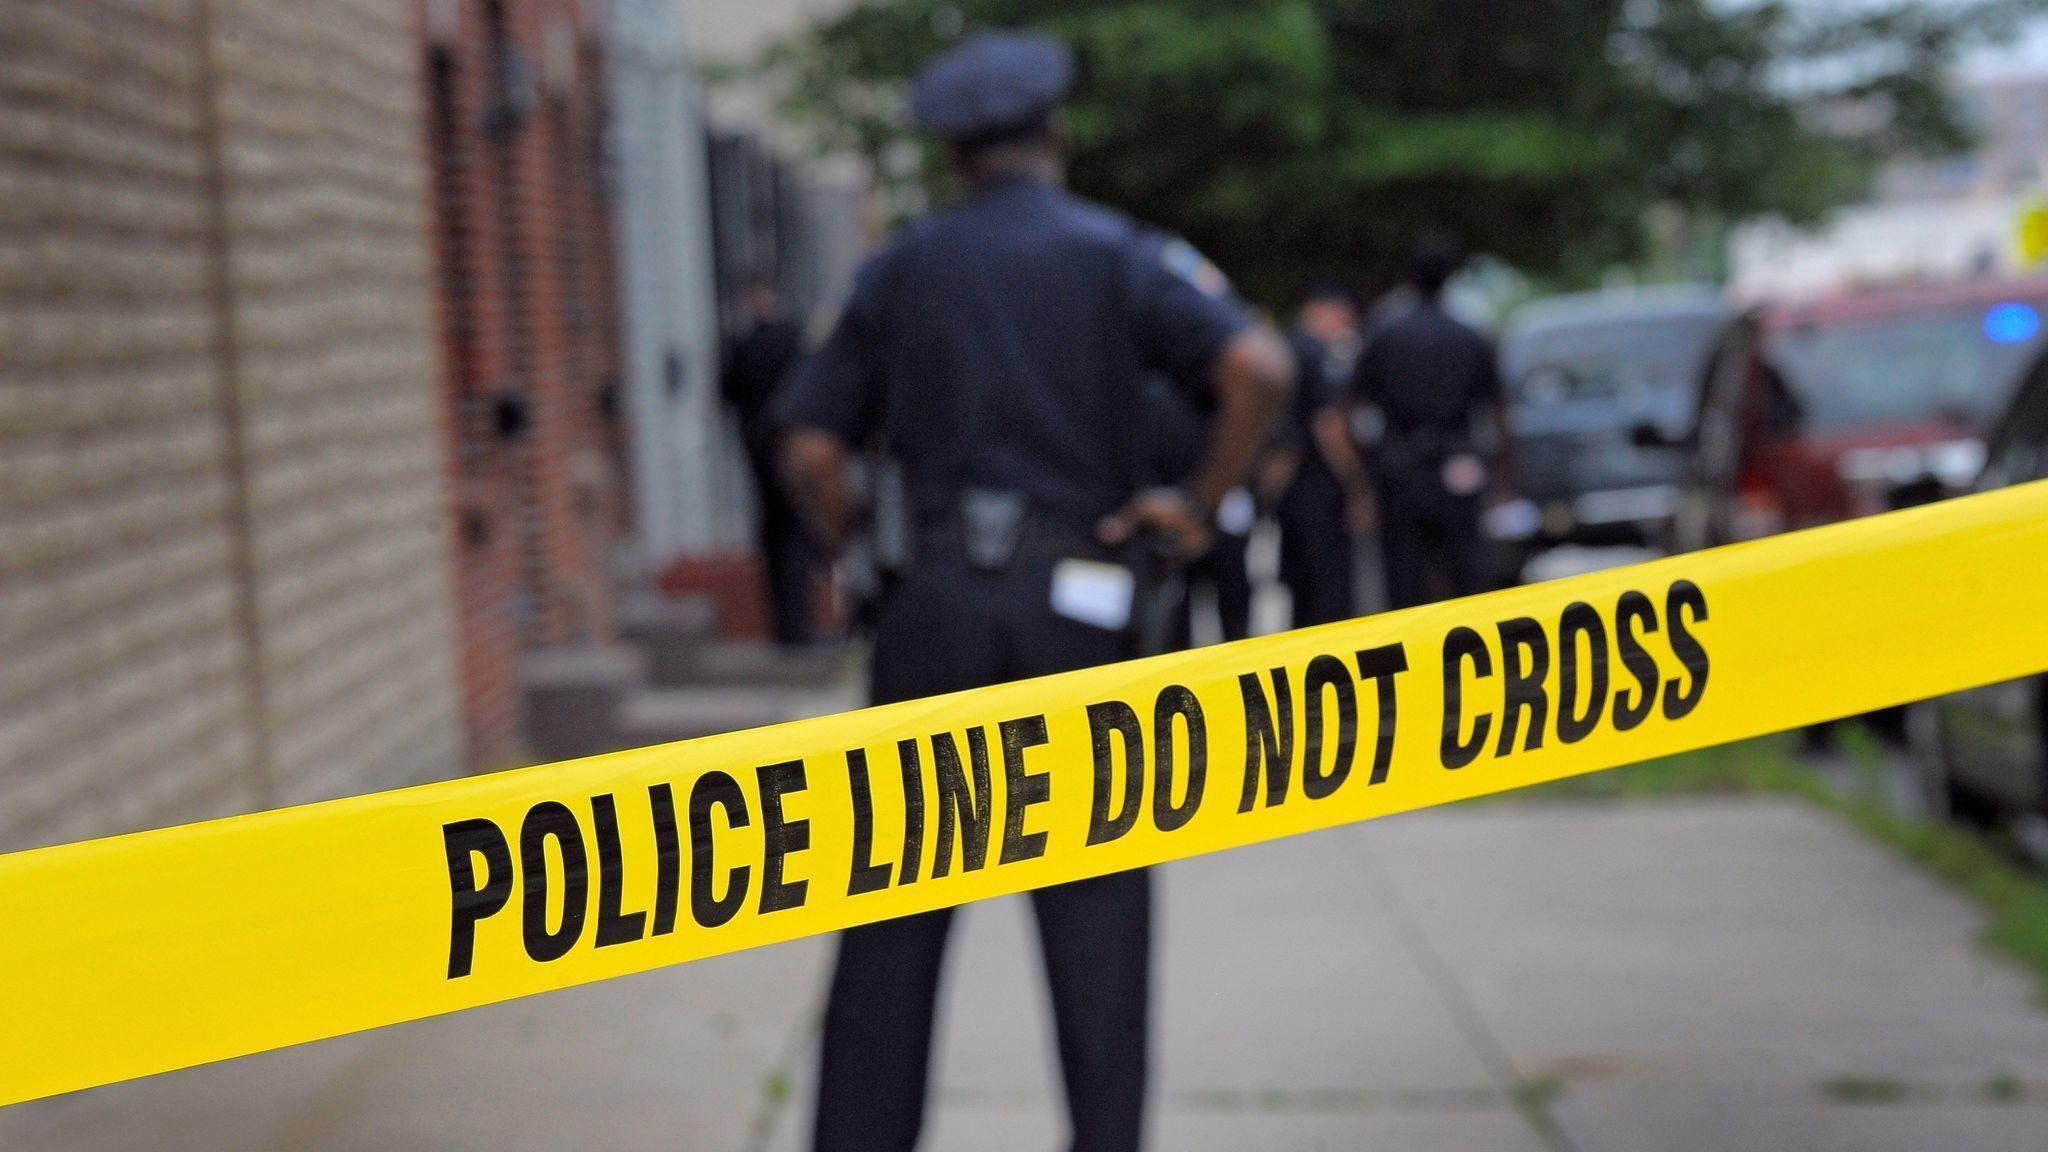 Arrest made in Howard Co. Walmart shooting - Howard County Times